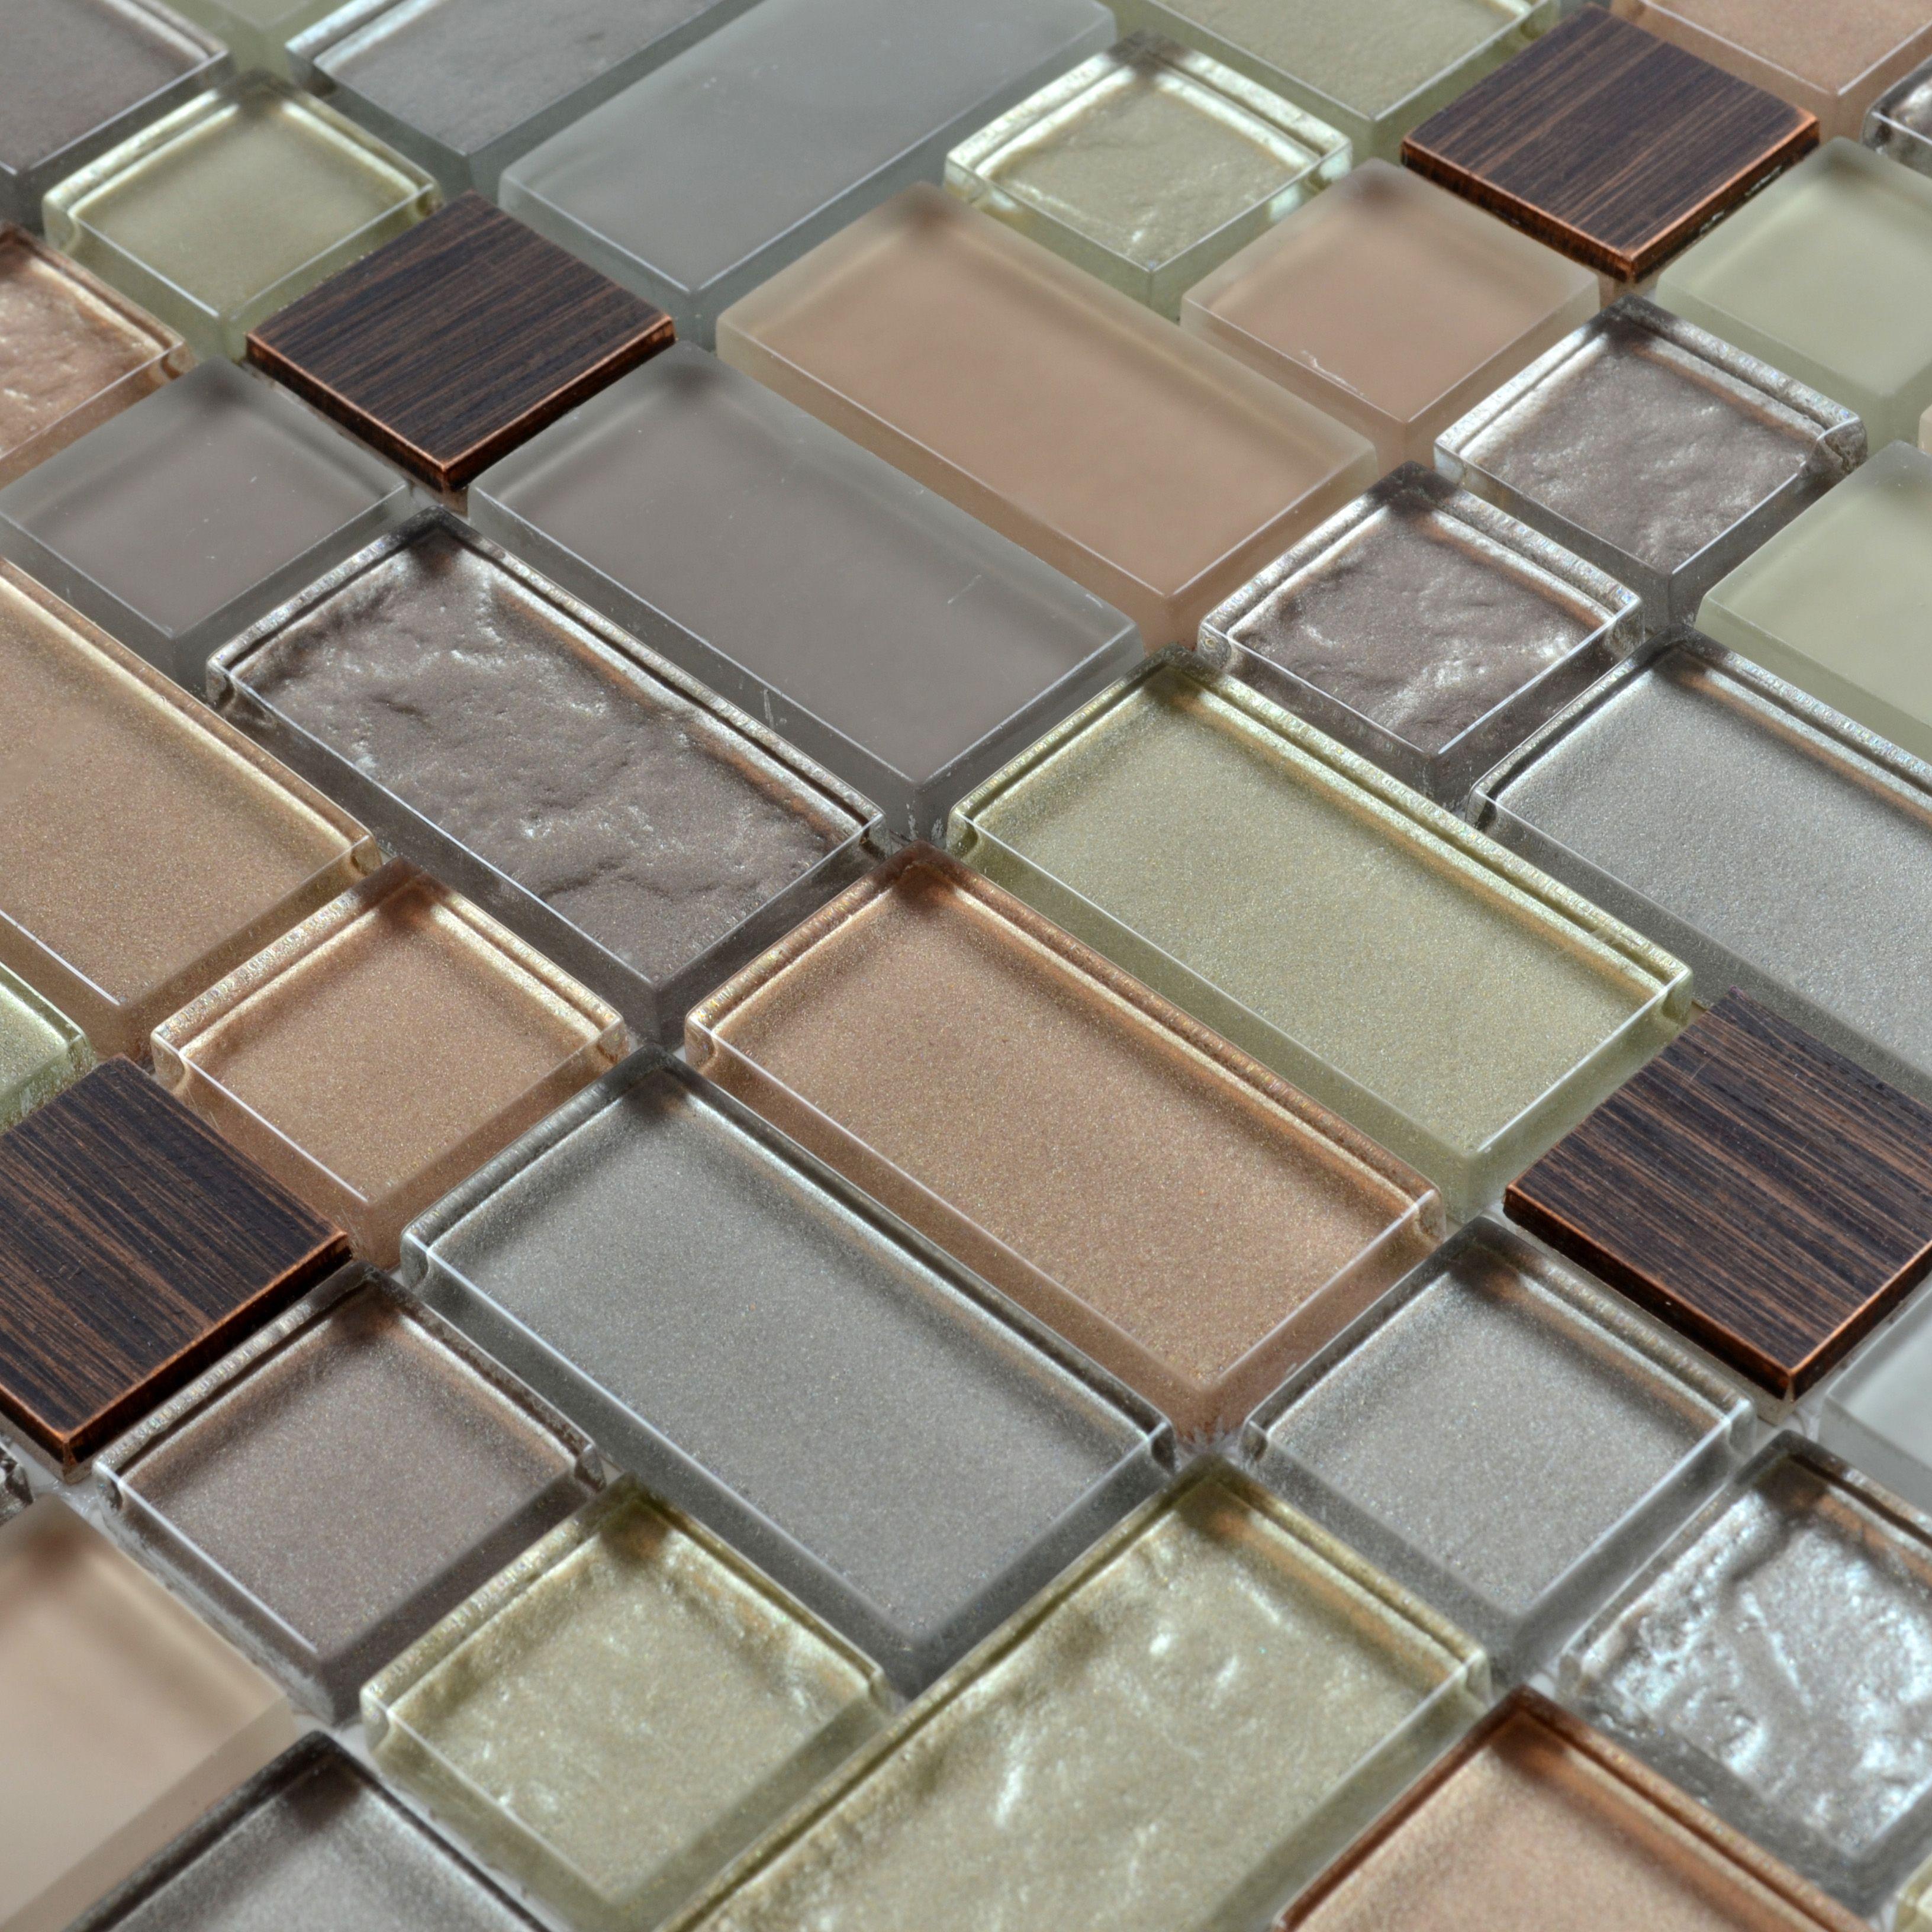 Metal And Glass Tile Backsplash Hand Painted Aluminum Tile Crystal Mosaic  Wall Decor MG005, Size